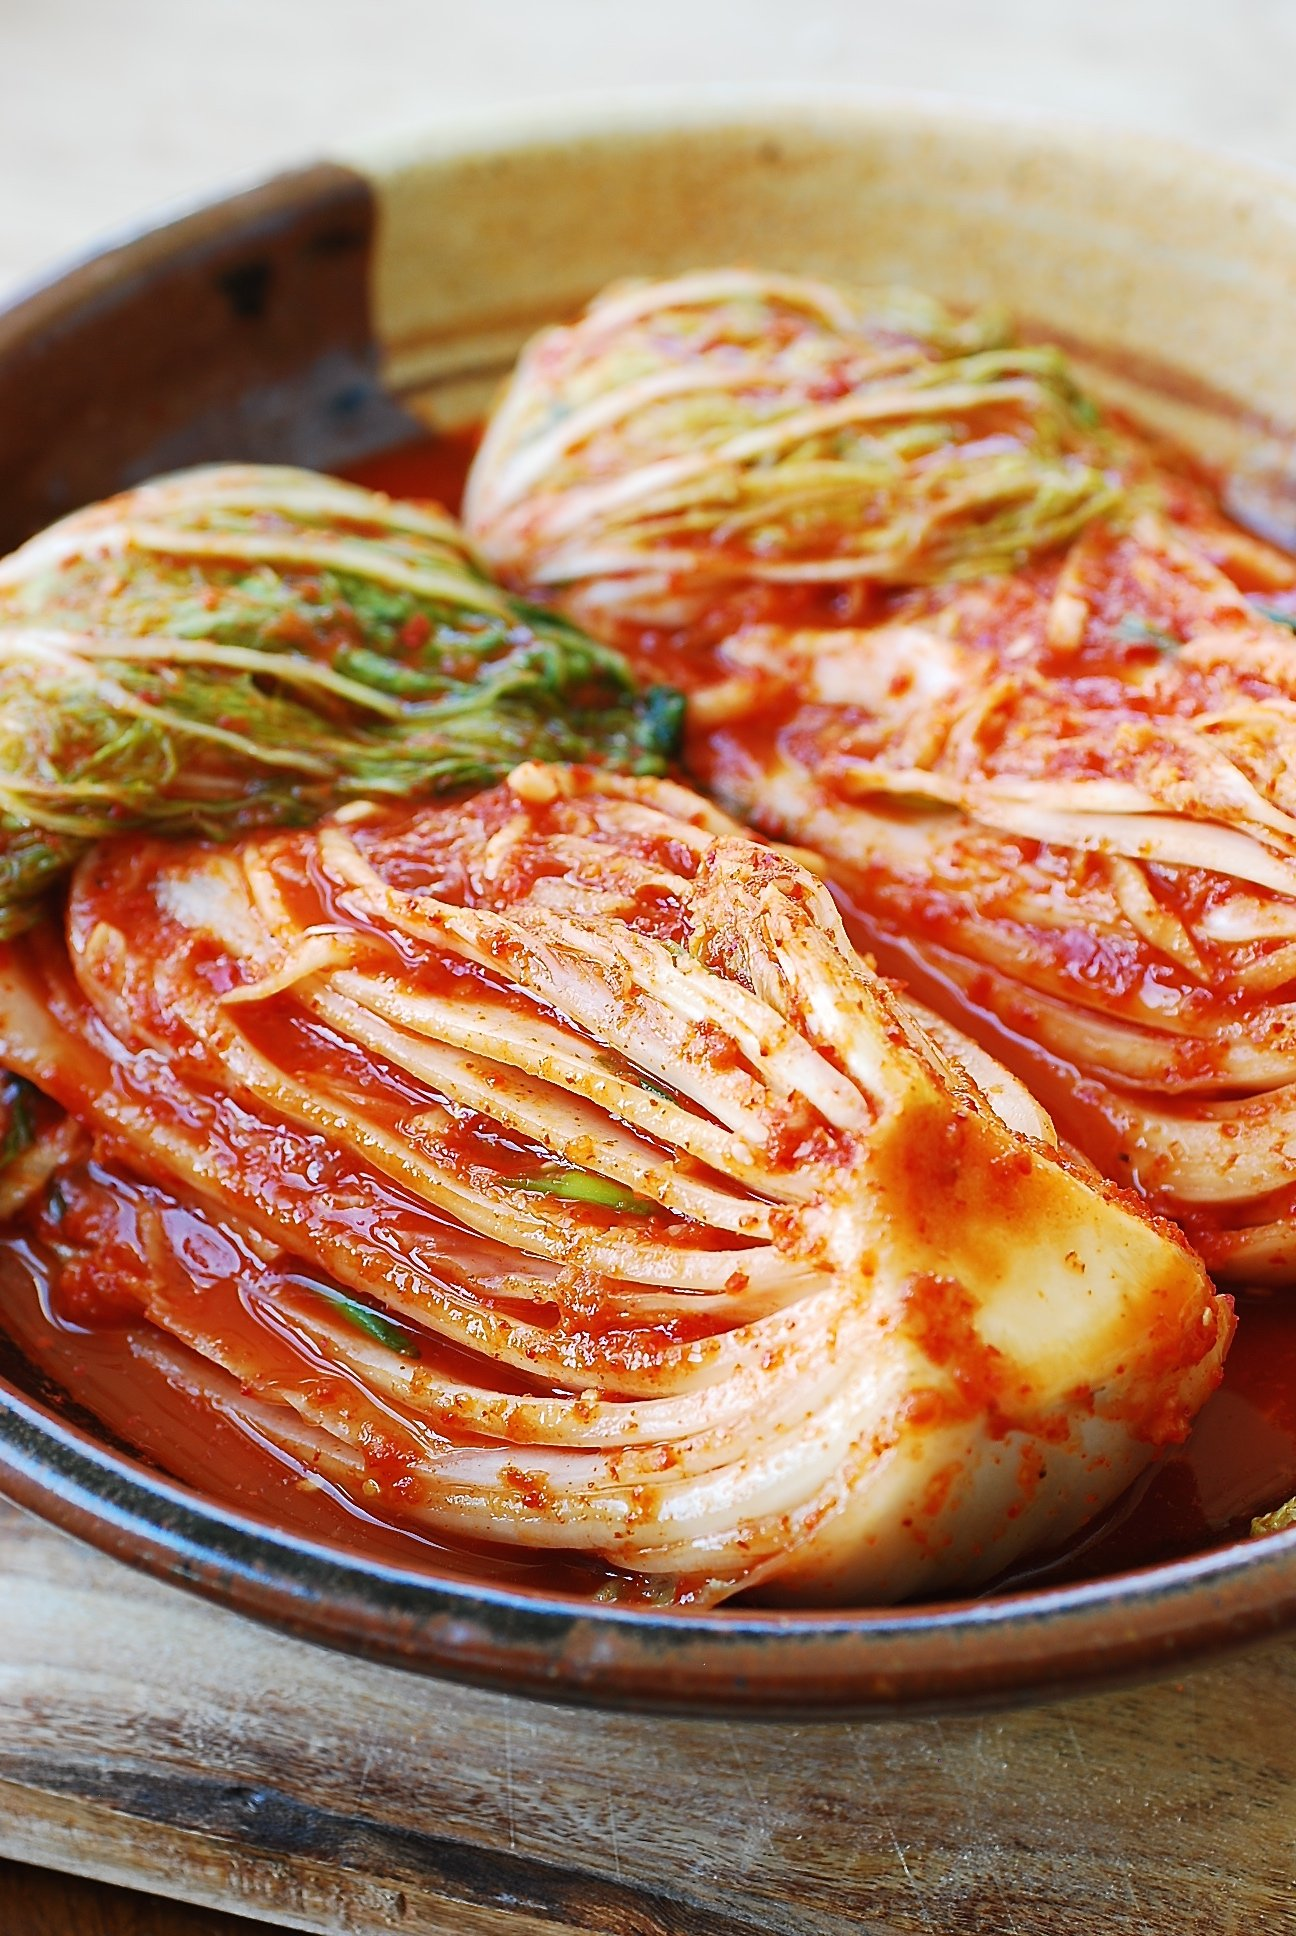 DSC 0831 - Traditional Kimchi (Napa Cabbage Kimchi)